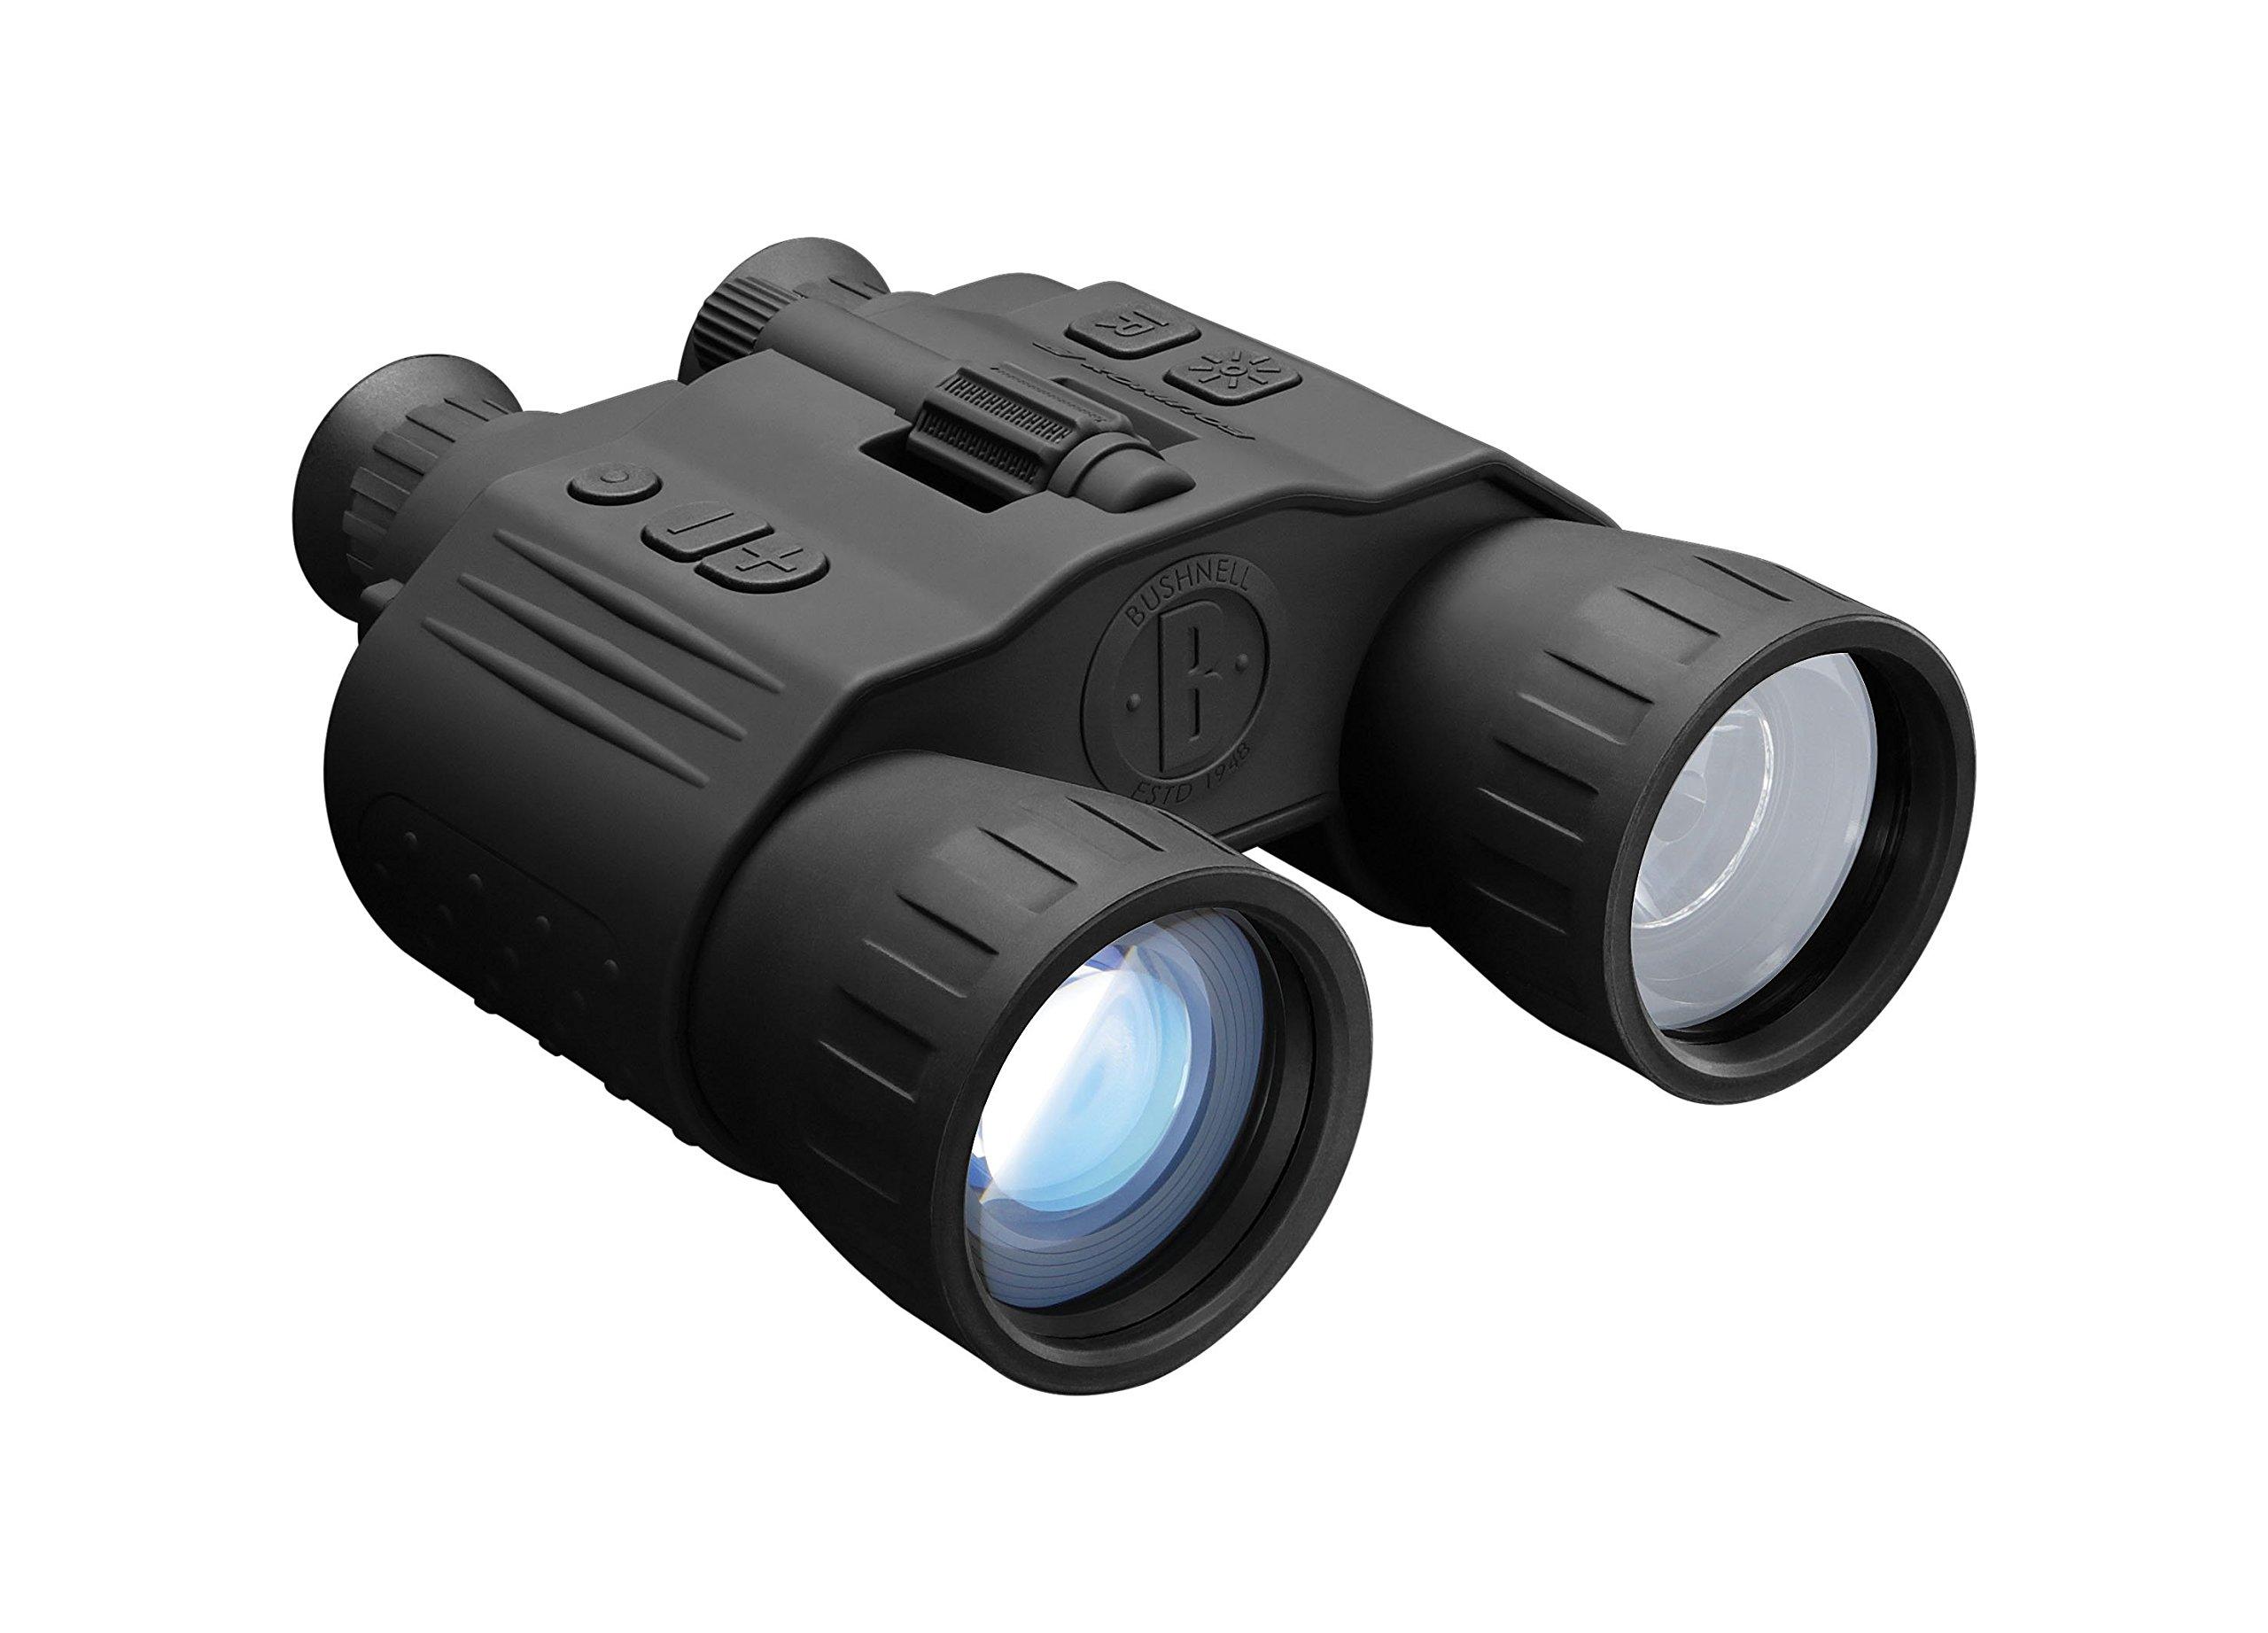 Bushnell 260501 Equinox Series 6L Night Vision Z Digital Binocular Box, 4 X 50, Black by Bushnell